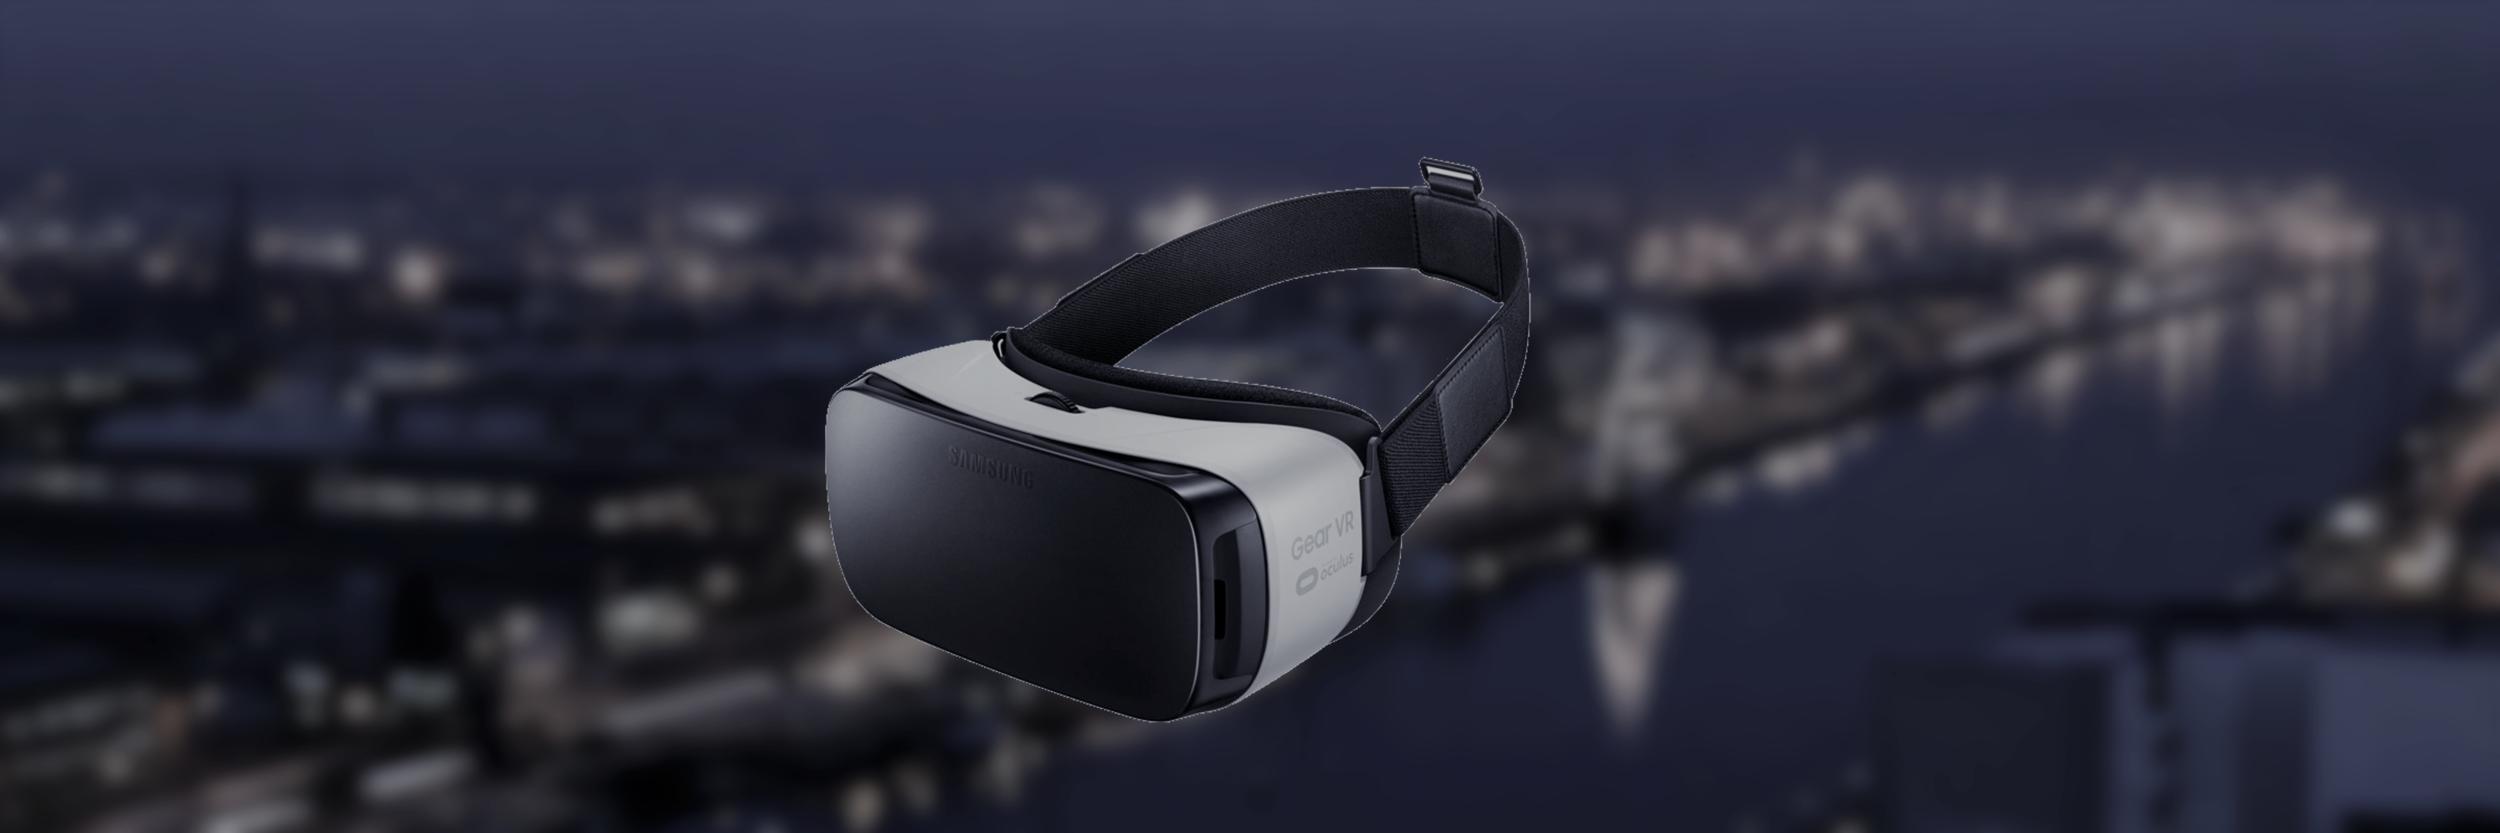 Samsung Gear VR -